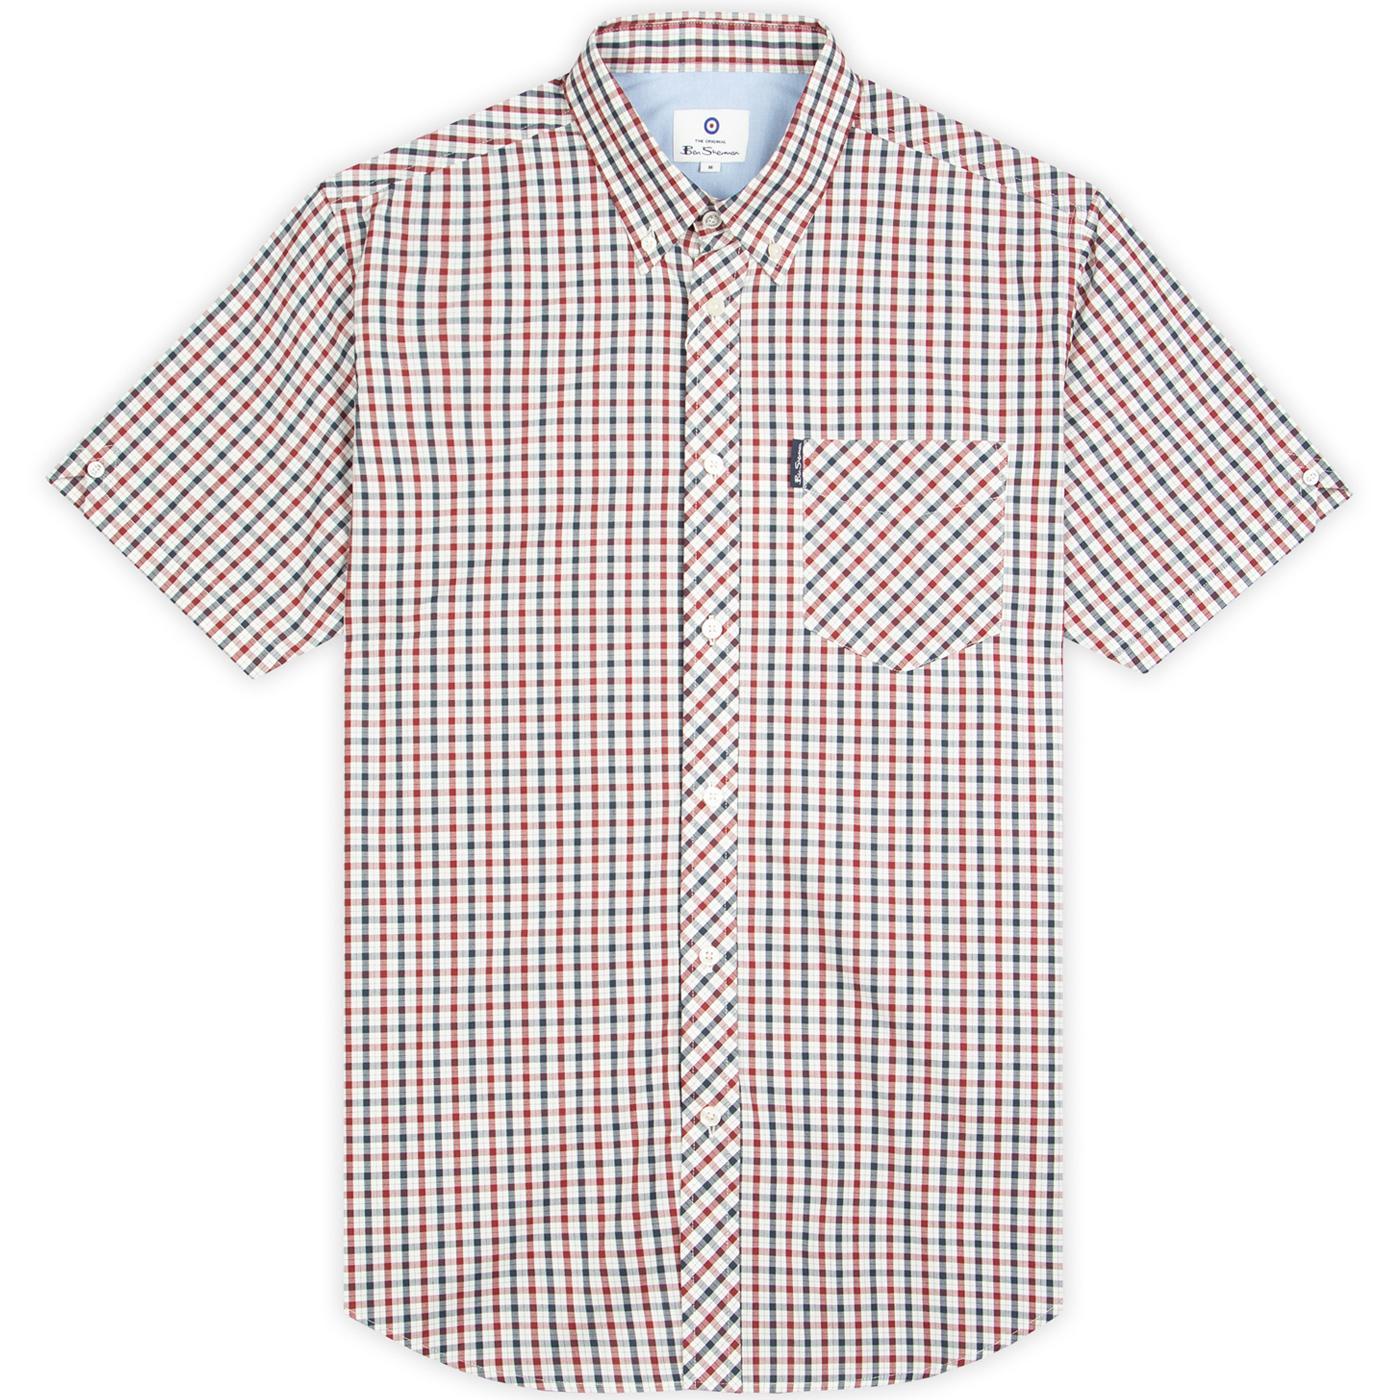 BEN SHERMAN 60s Mod SS Signature House Check Shirt